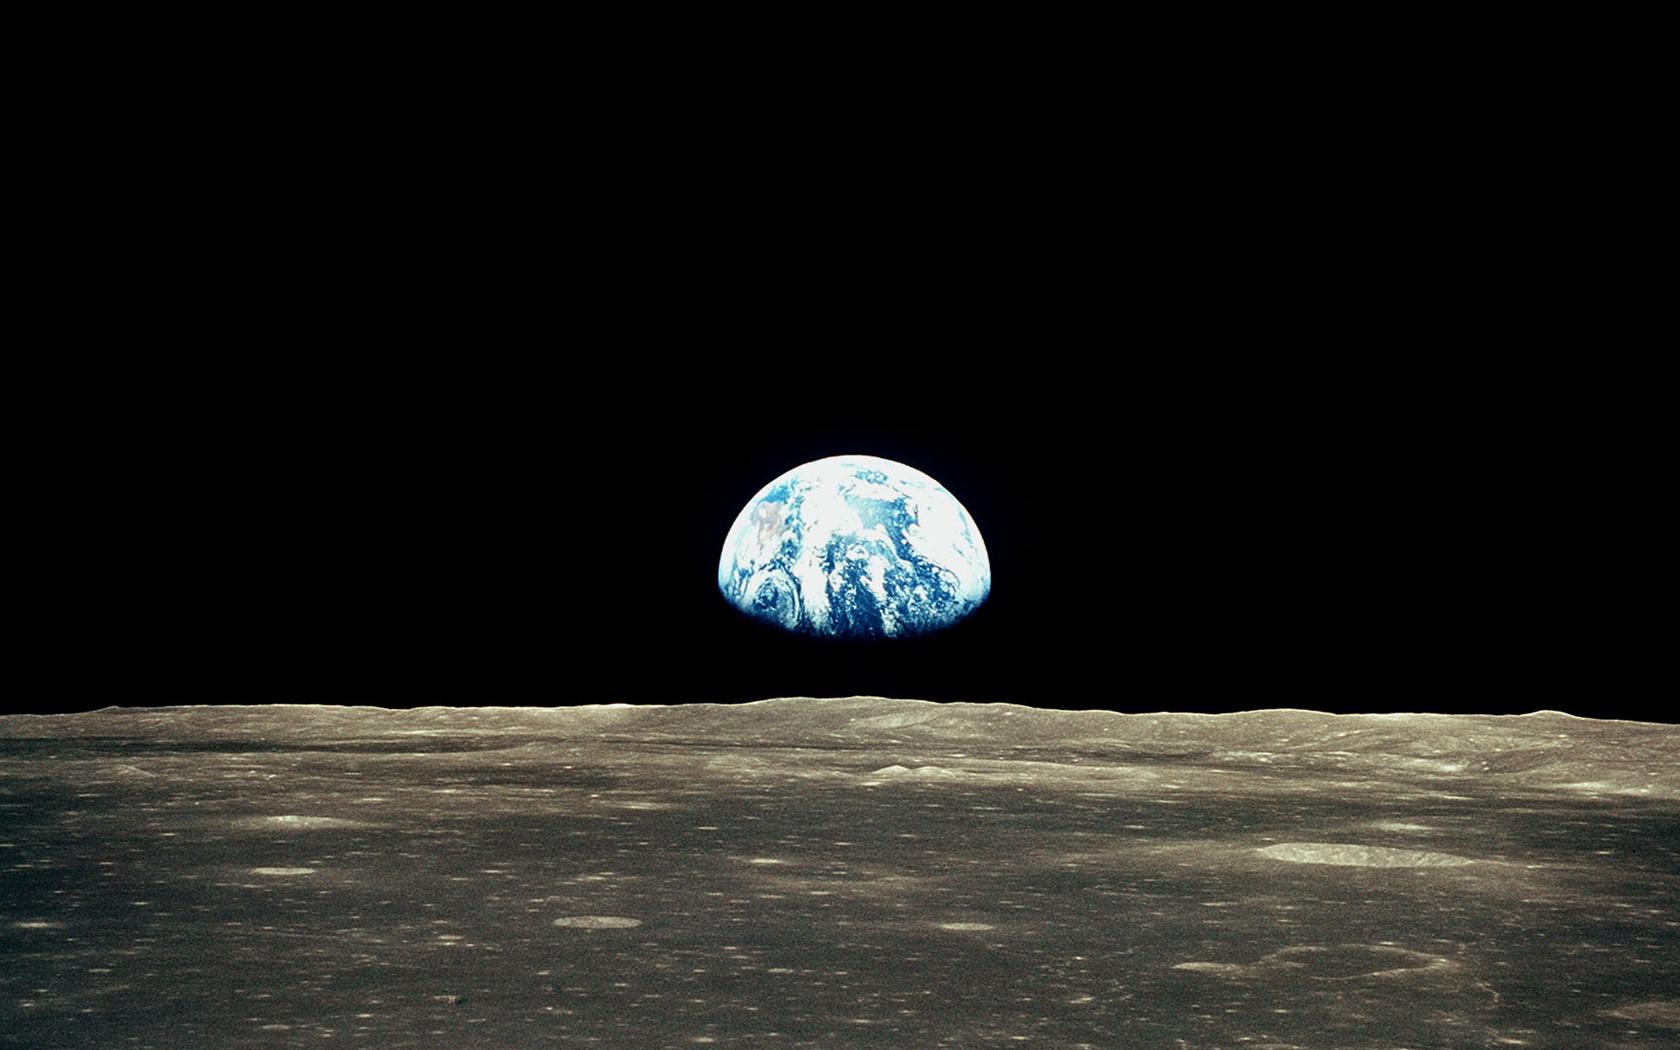 earth like moon - HD1680×1050